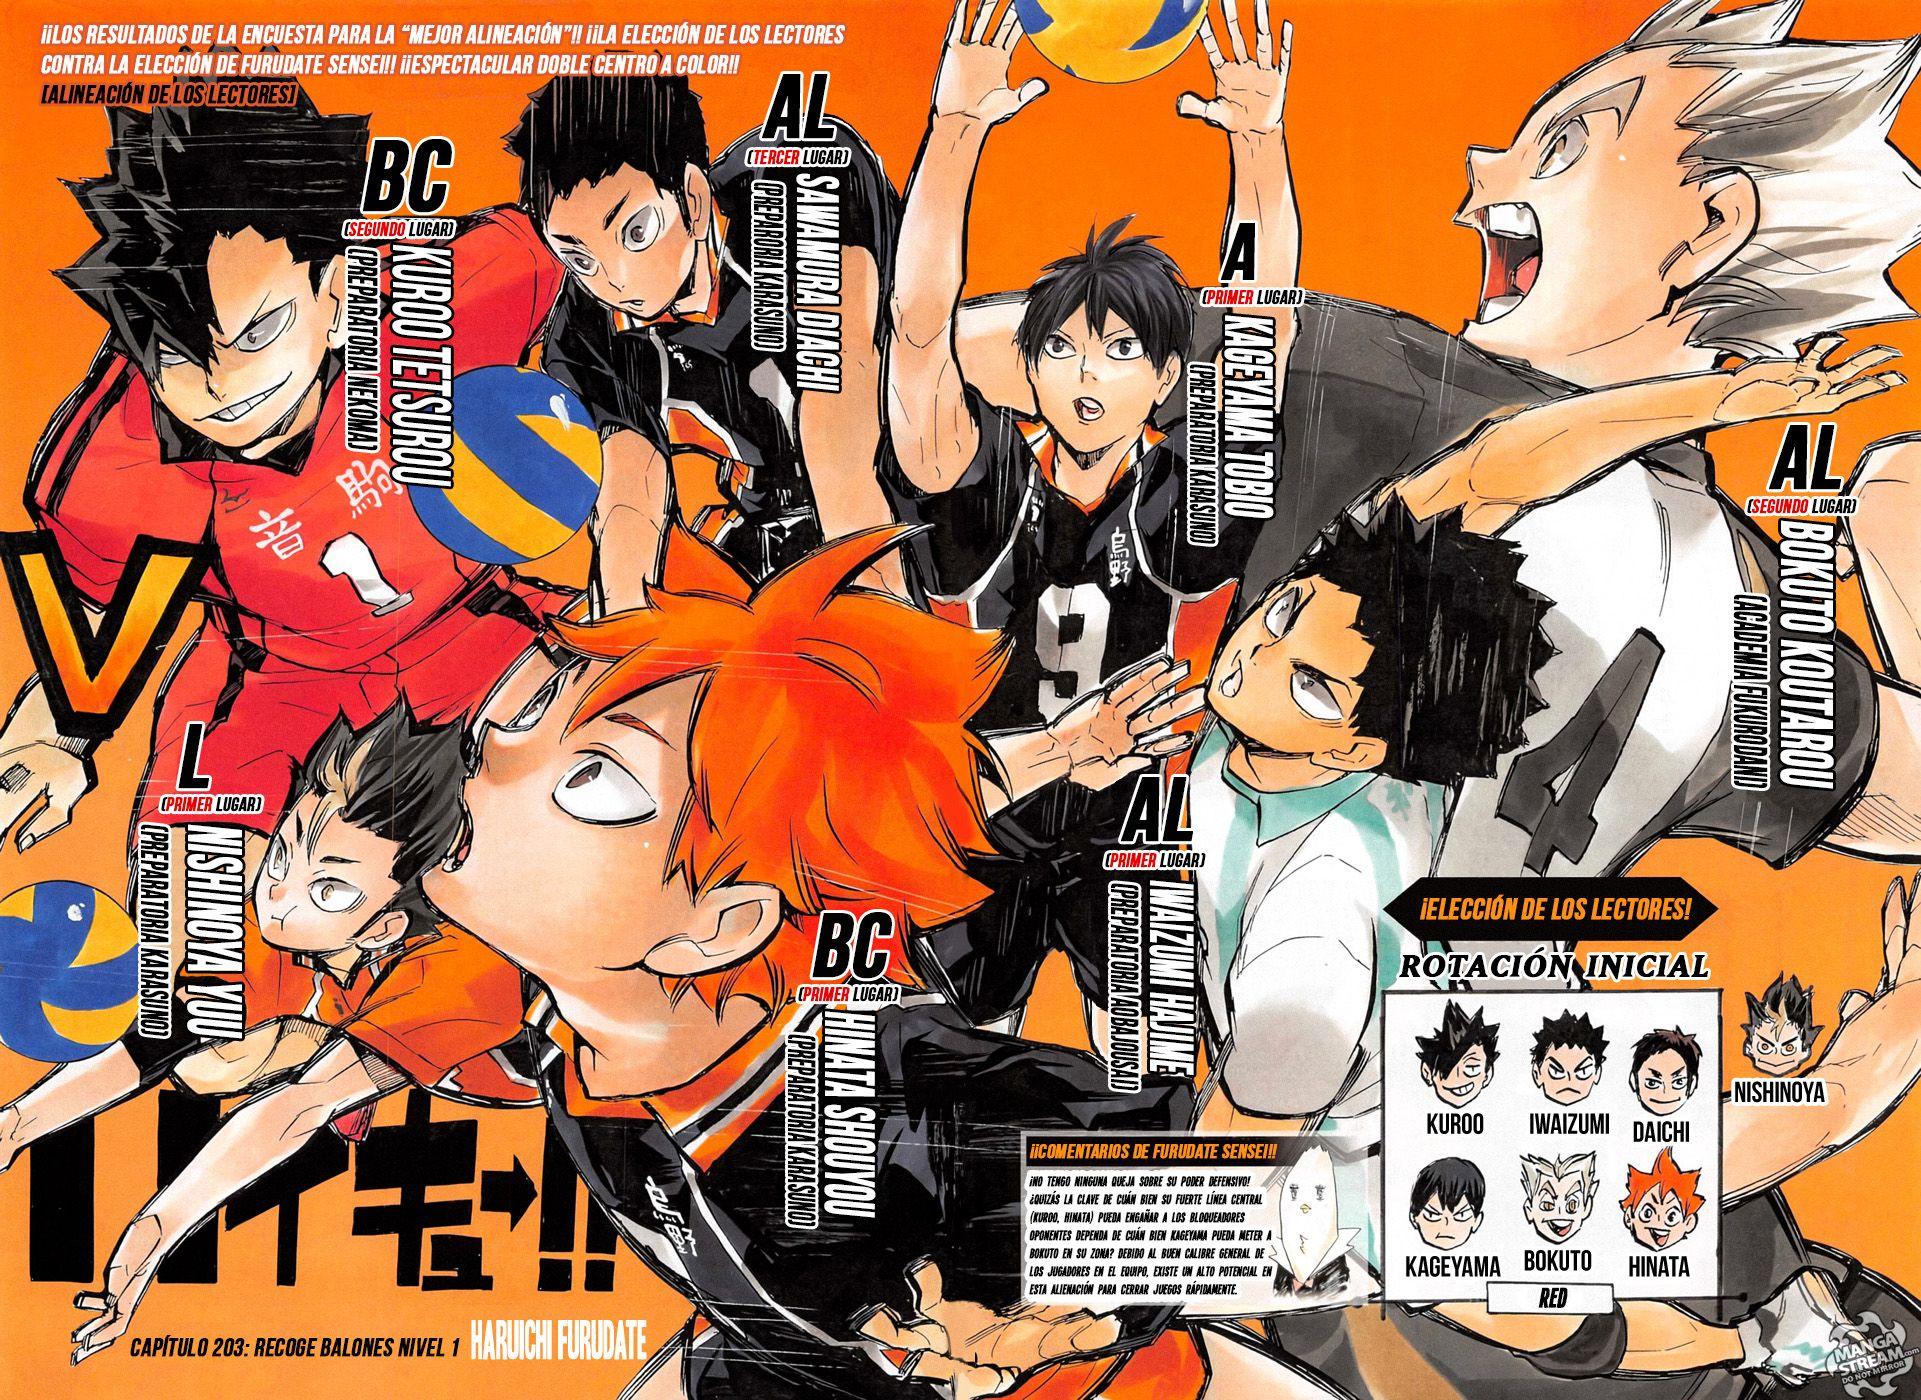 http://c5.ninemanga.com/es_manga/10/10/482839/94a451372ed808fb595369949a875be0.jpg Page 3